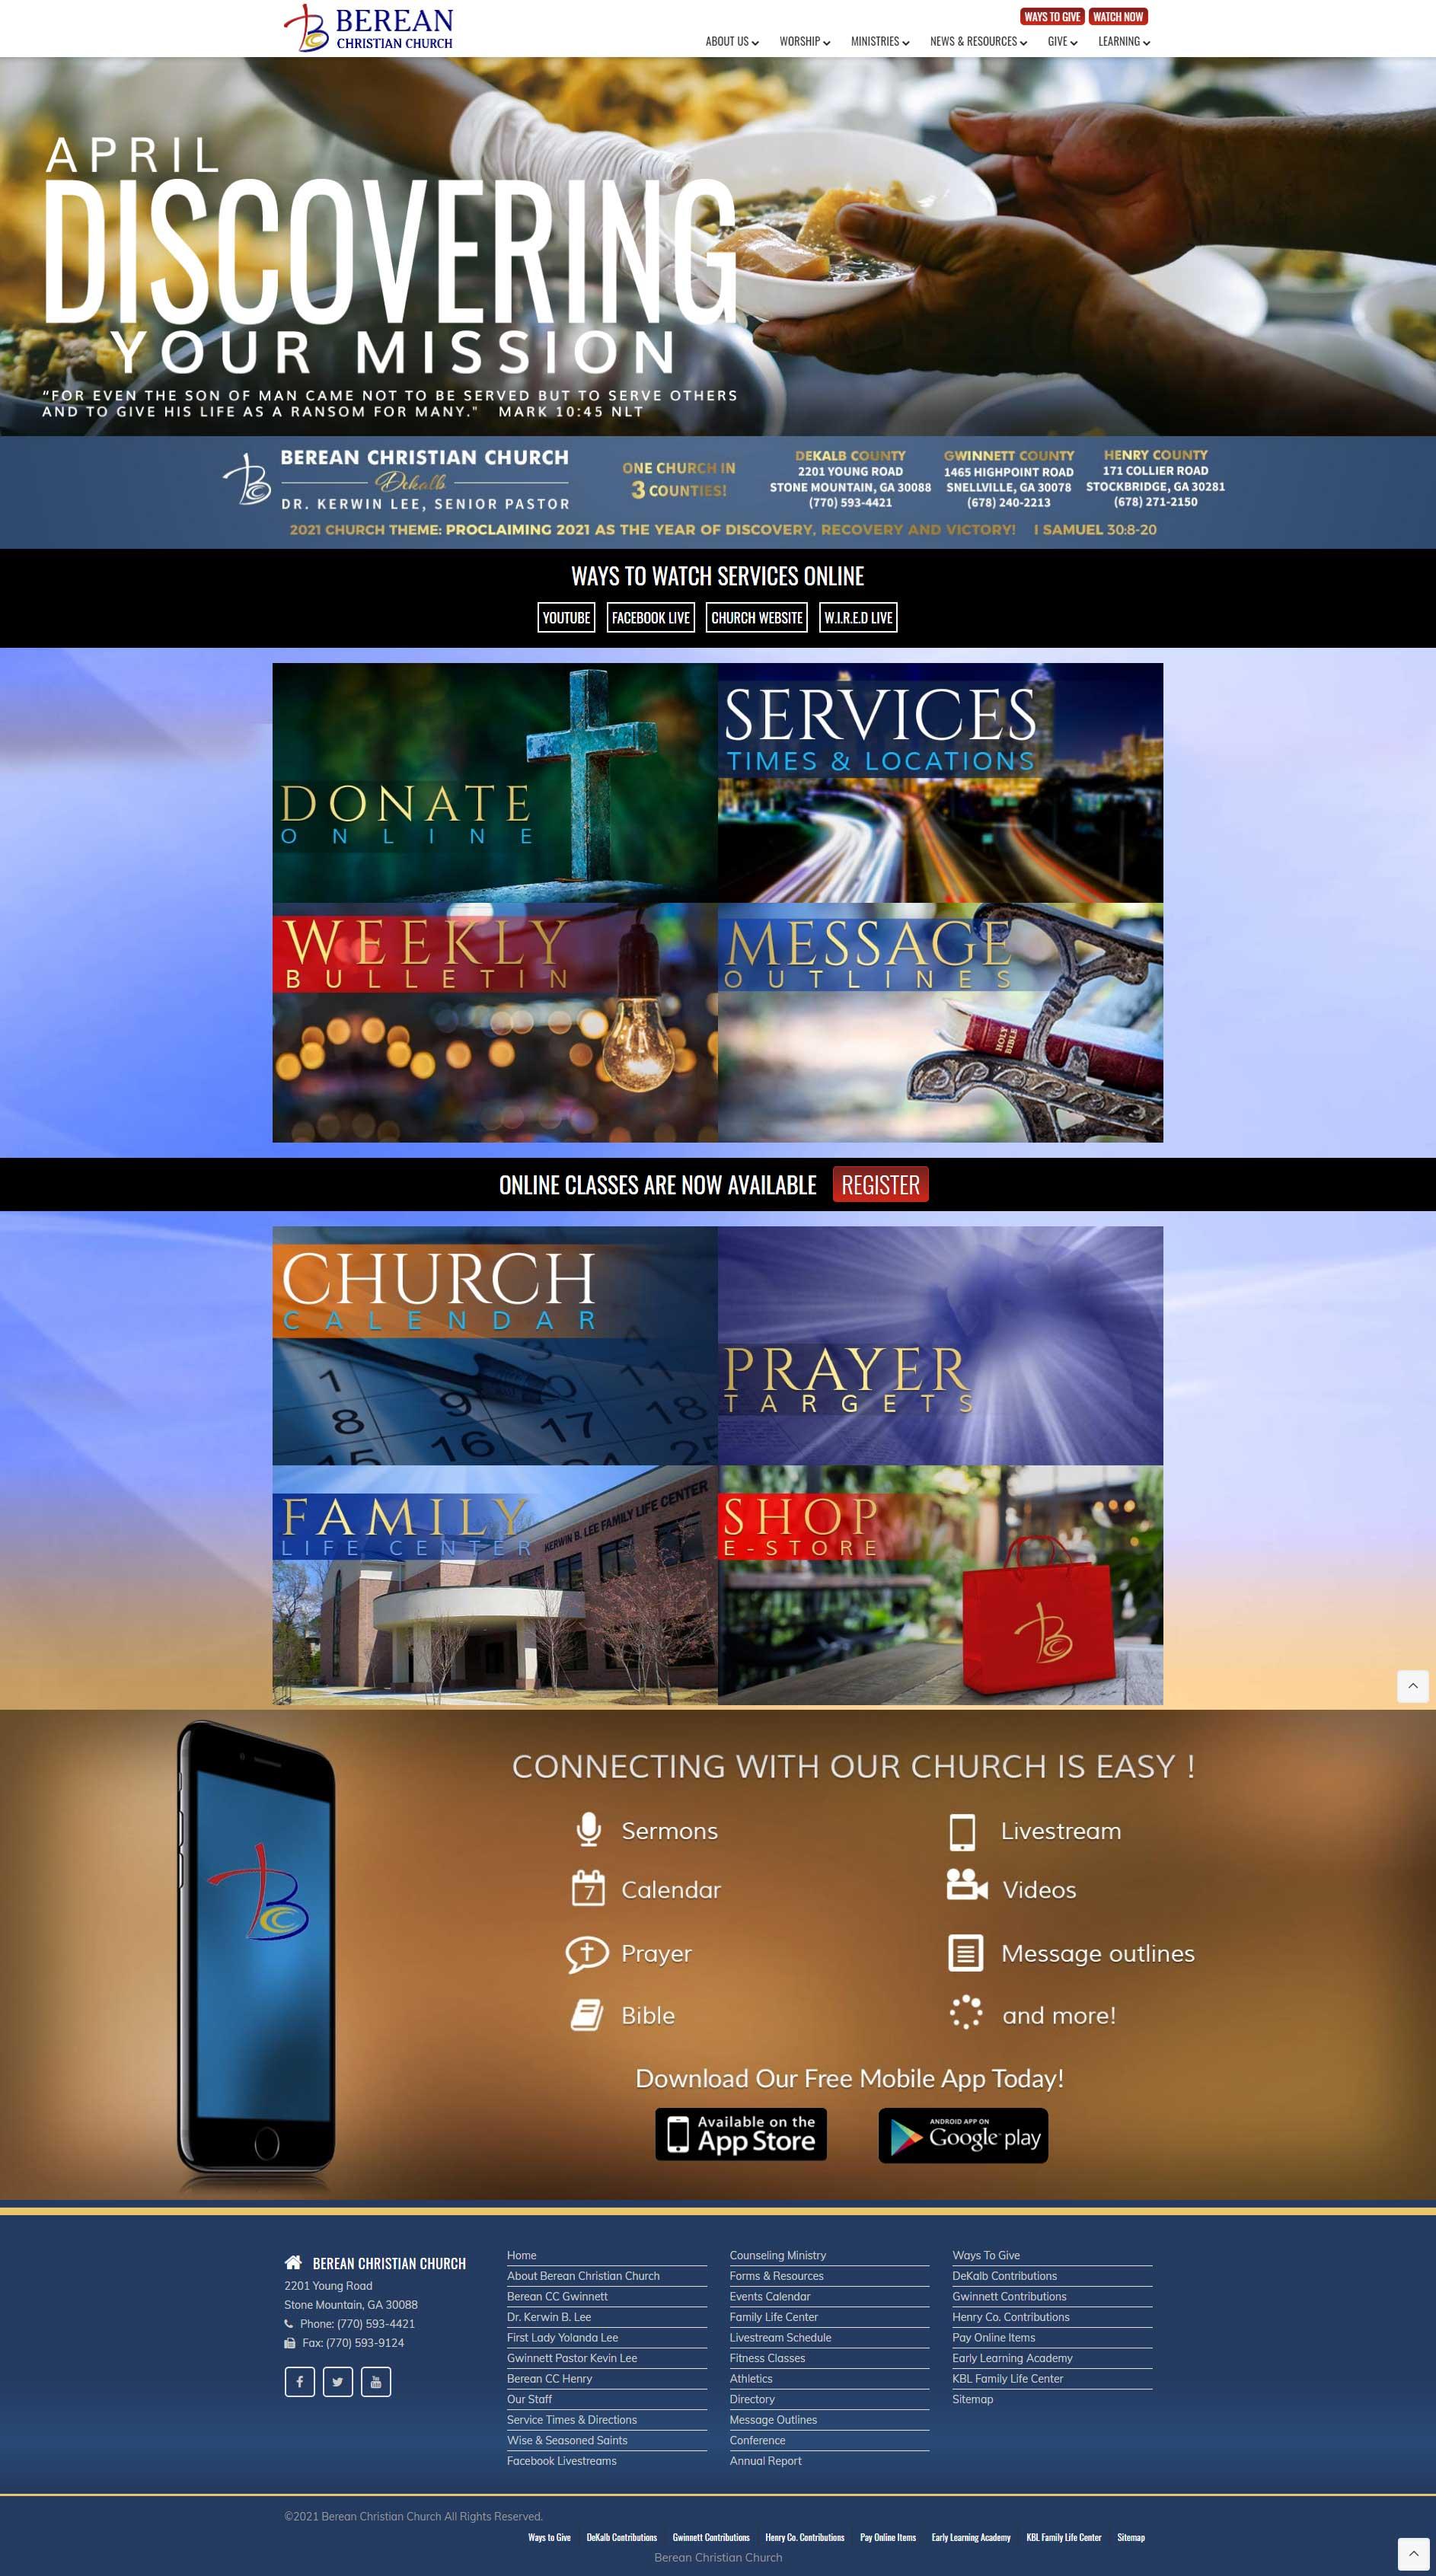 Berean Christian Church Website Design